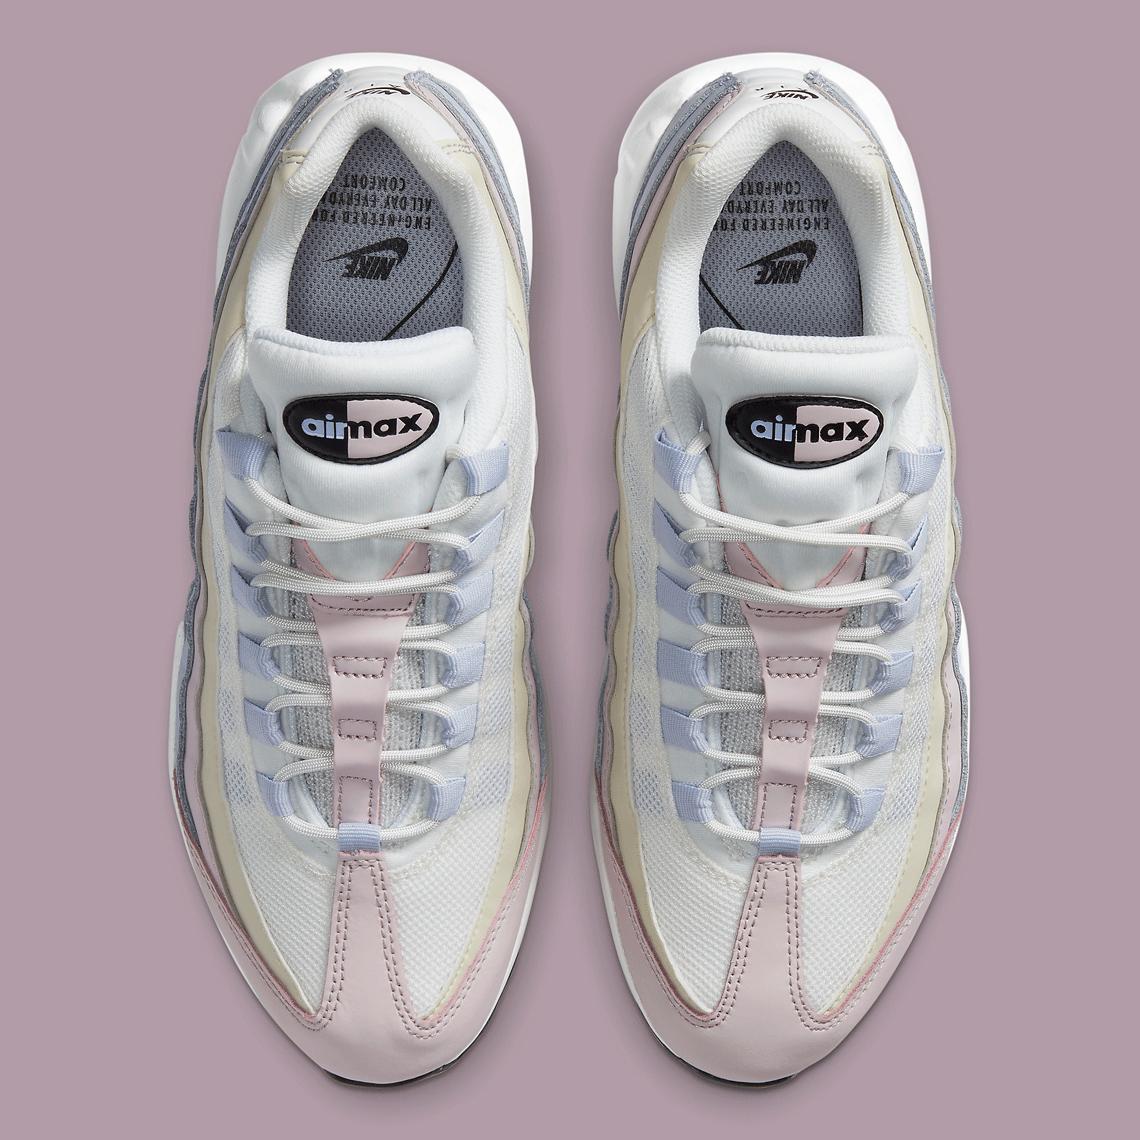 Nike Air Max 95 Femme Barely Rose CZ5659-001 - Crumpe